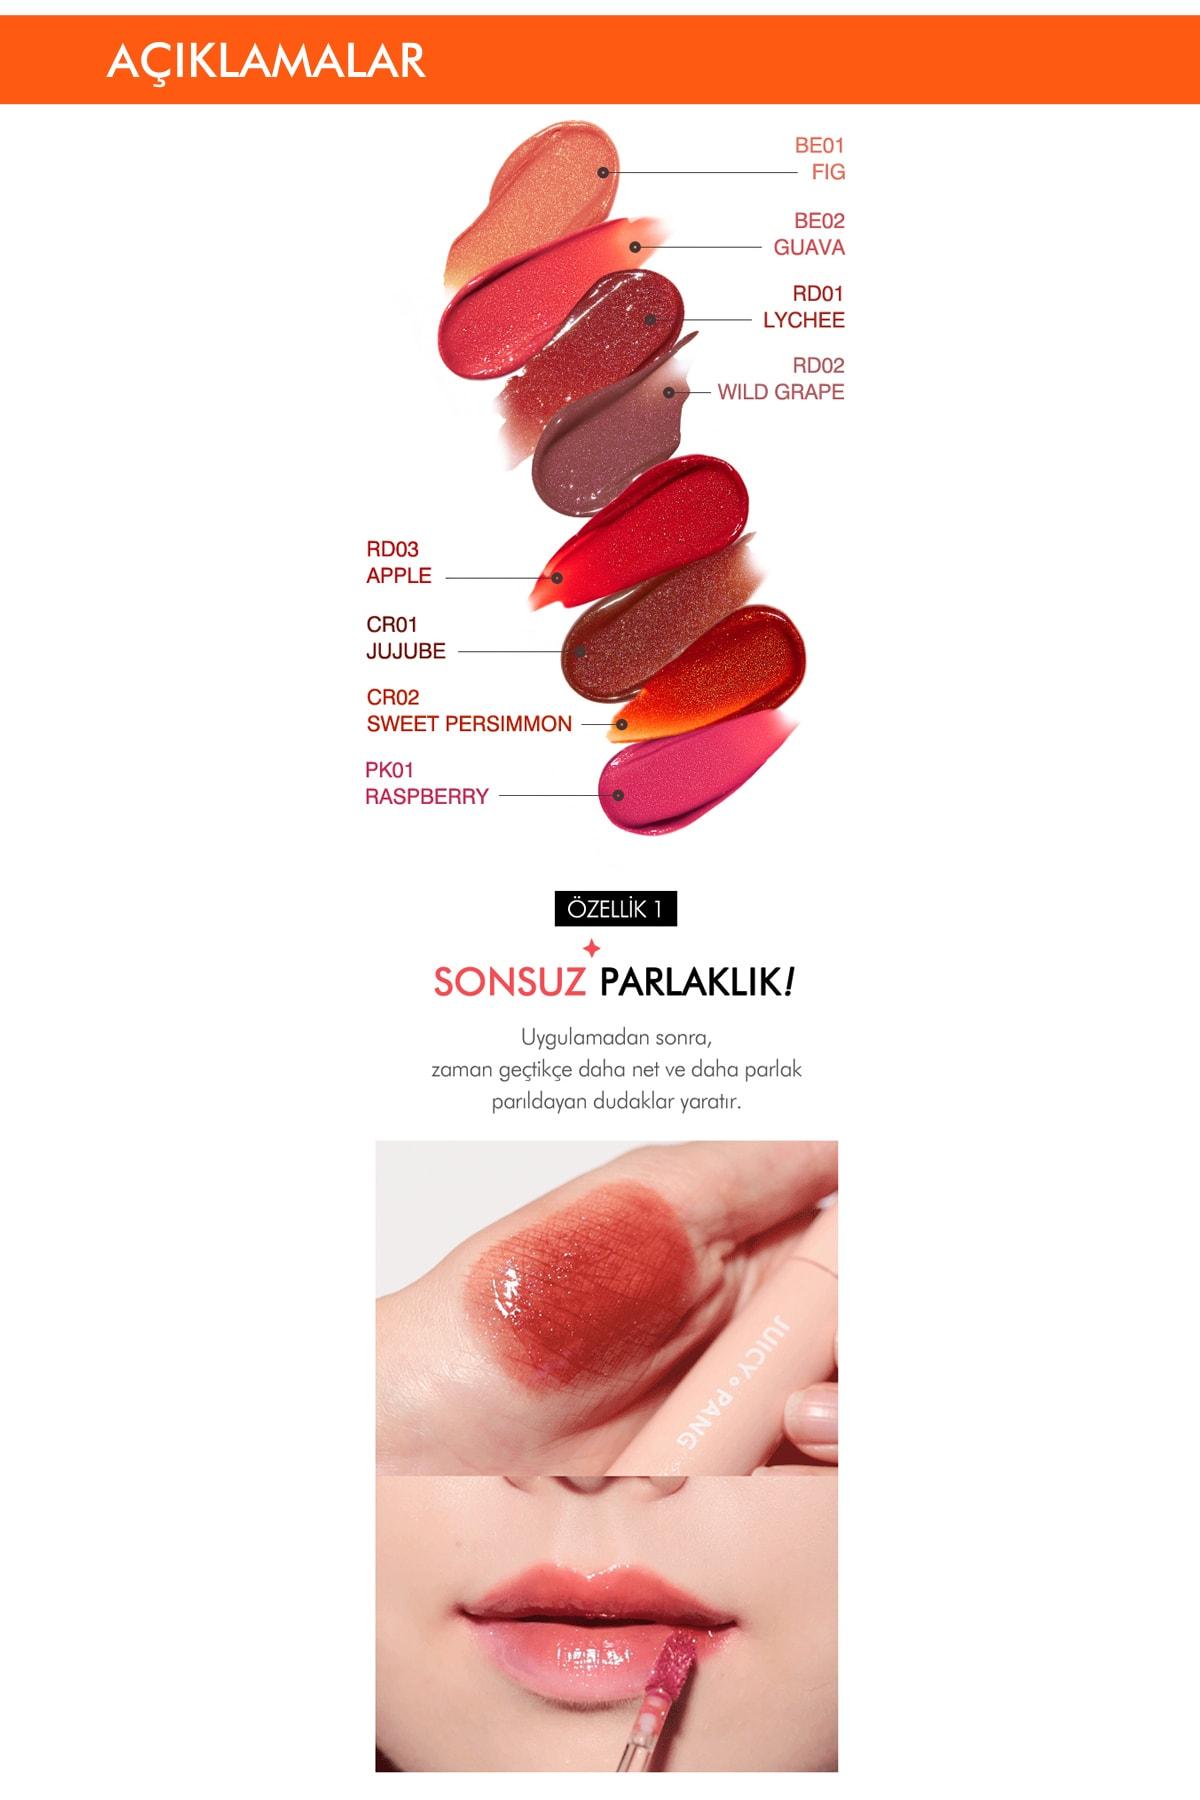 Missha Işıltı&Dolgunluk Veren Parlak Gloss Tint APIEU Juicy-Pang Sparkling Tint BE02 3